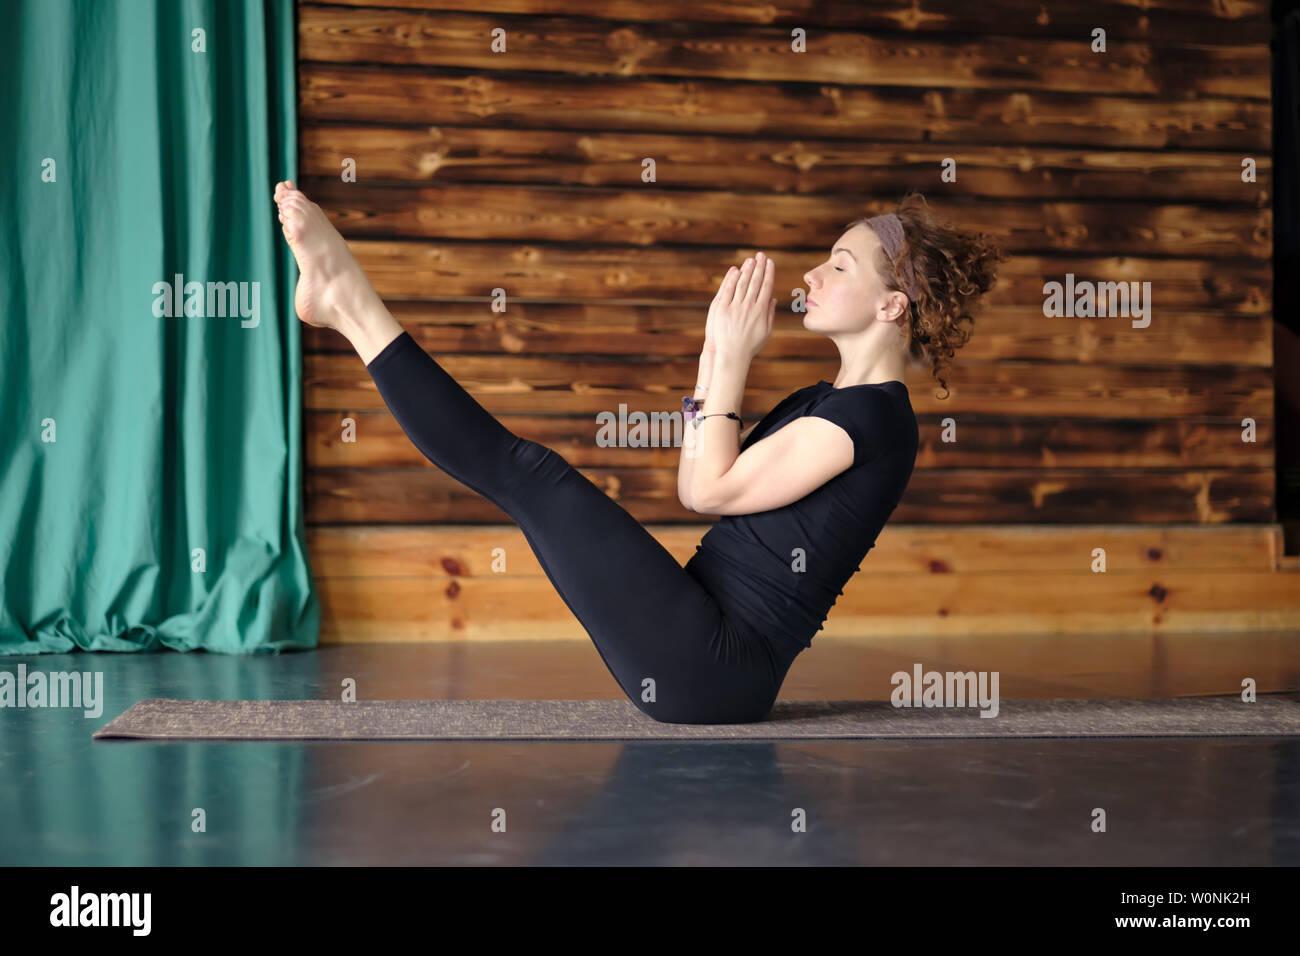 Woman practicing yoga, sitting in balance exercise, Paripurna Navasana pose - Stock Image